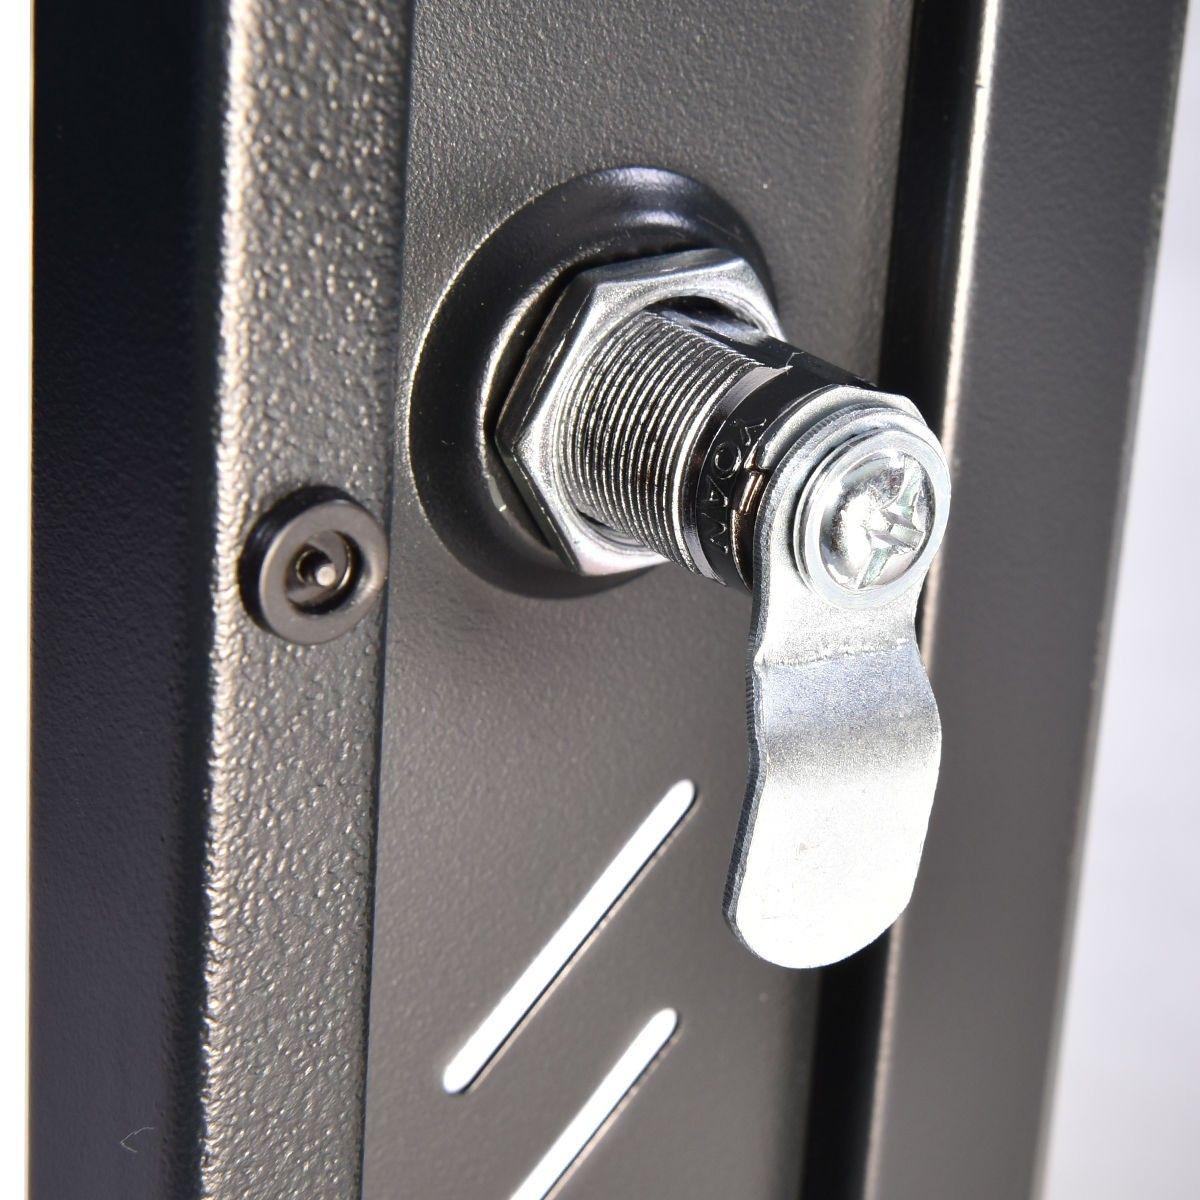 15u Wall Mount Network Server Data Cabinet Enclosure Rack Glass Door Lock W Fan Glass Door Lock Wall Mount Data Cabinet